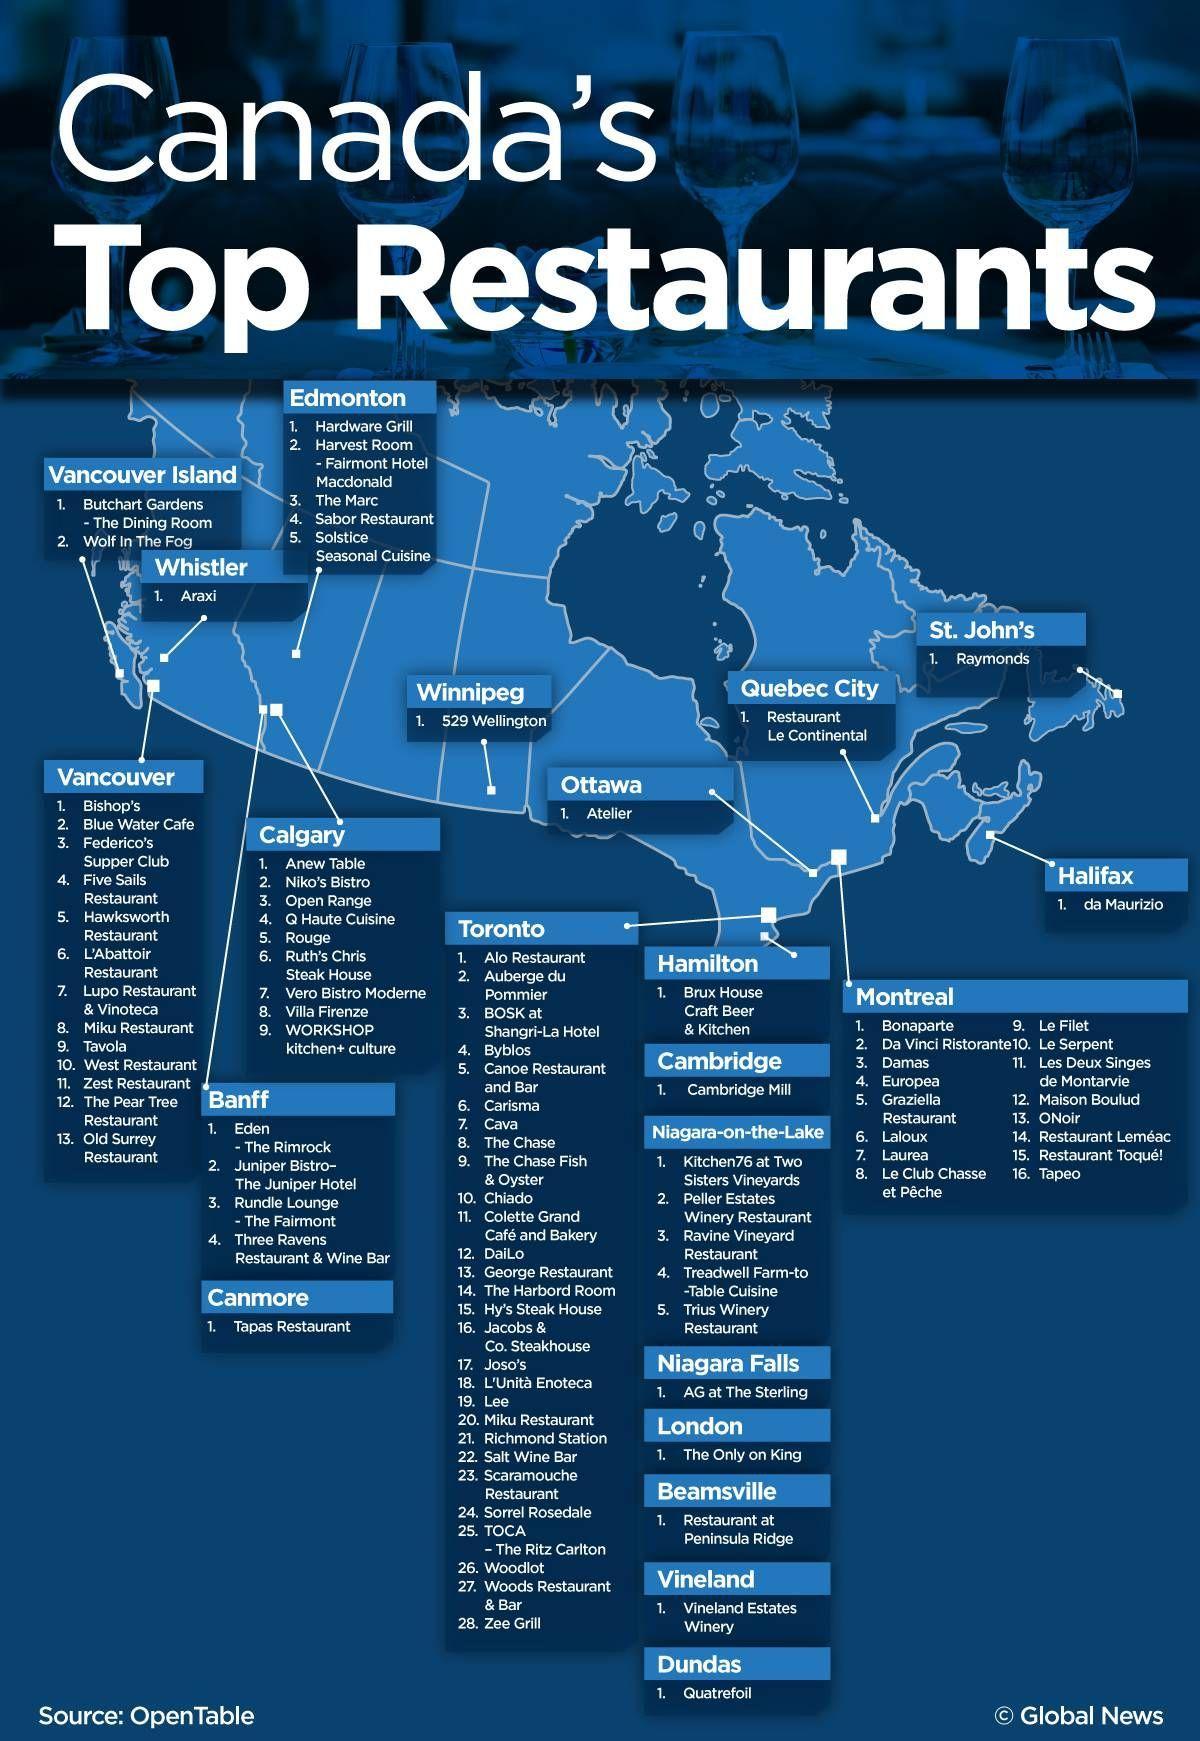 Canada's 9 best restaurants, according to OpenTable avec images ...